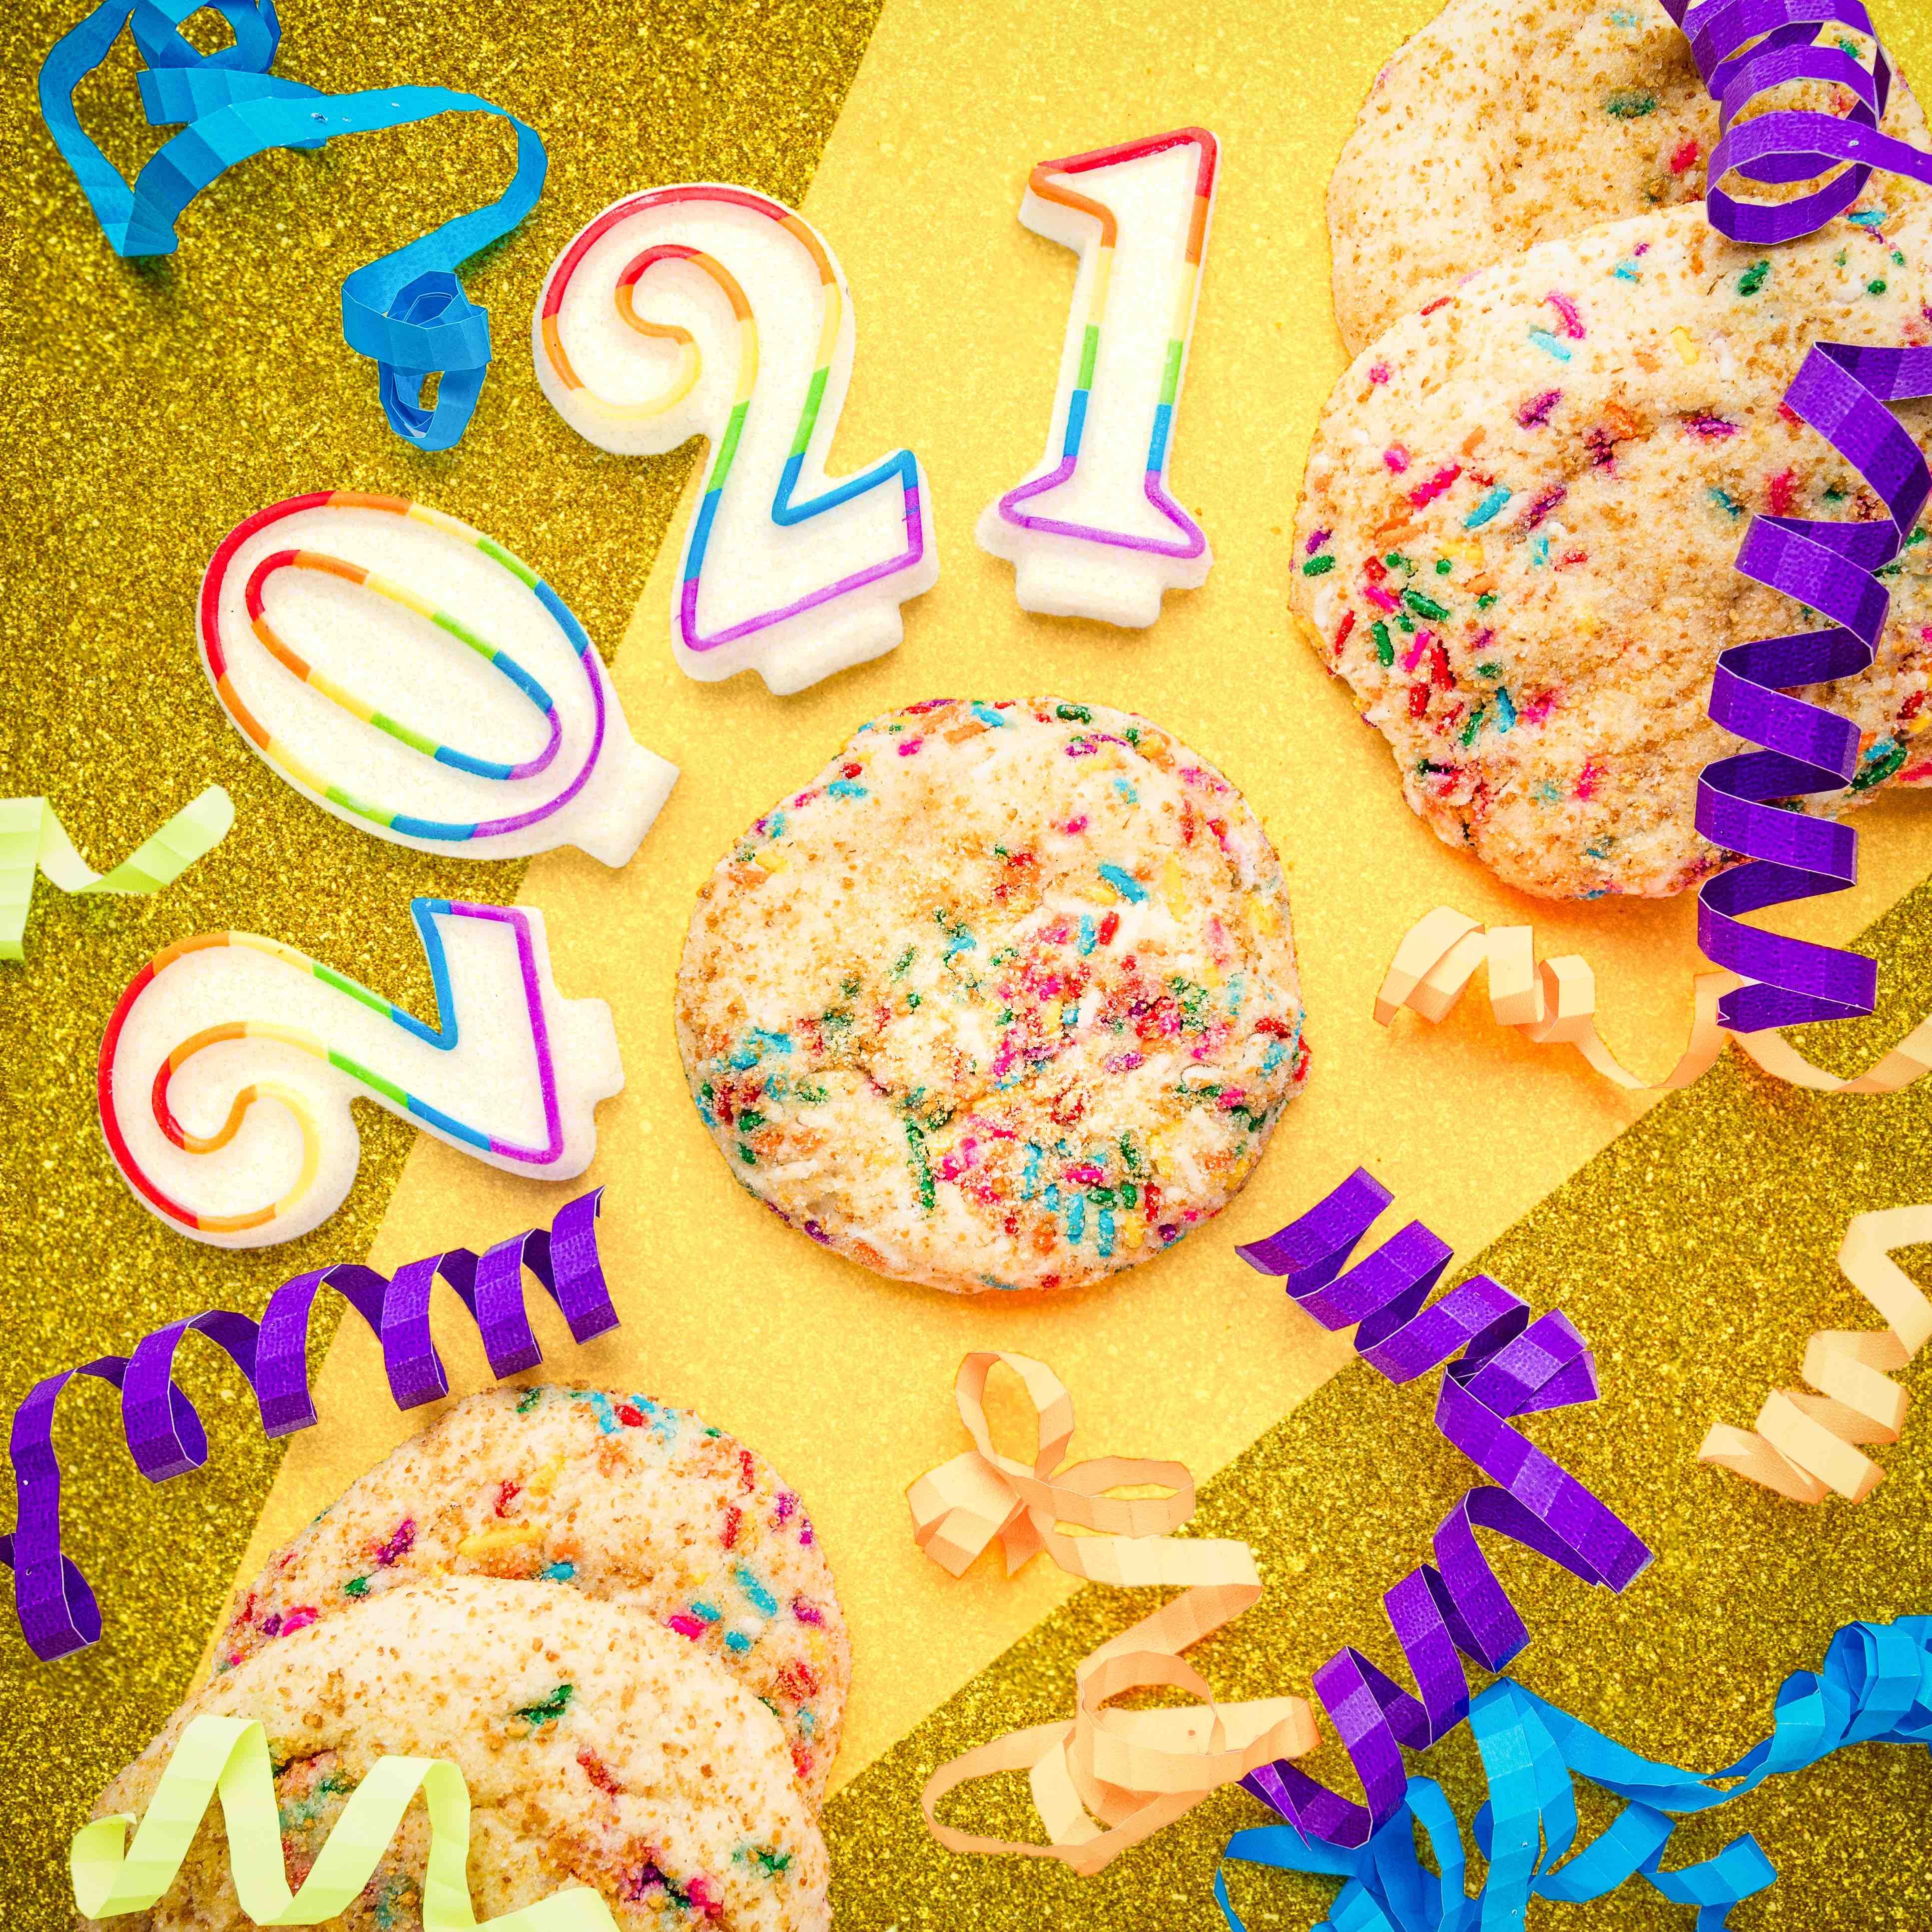 Appalachia Cookie Companys NYE campaign